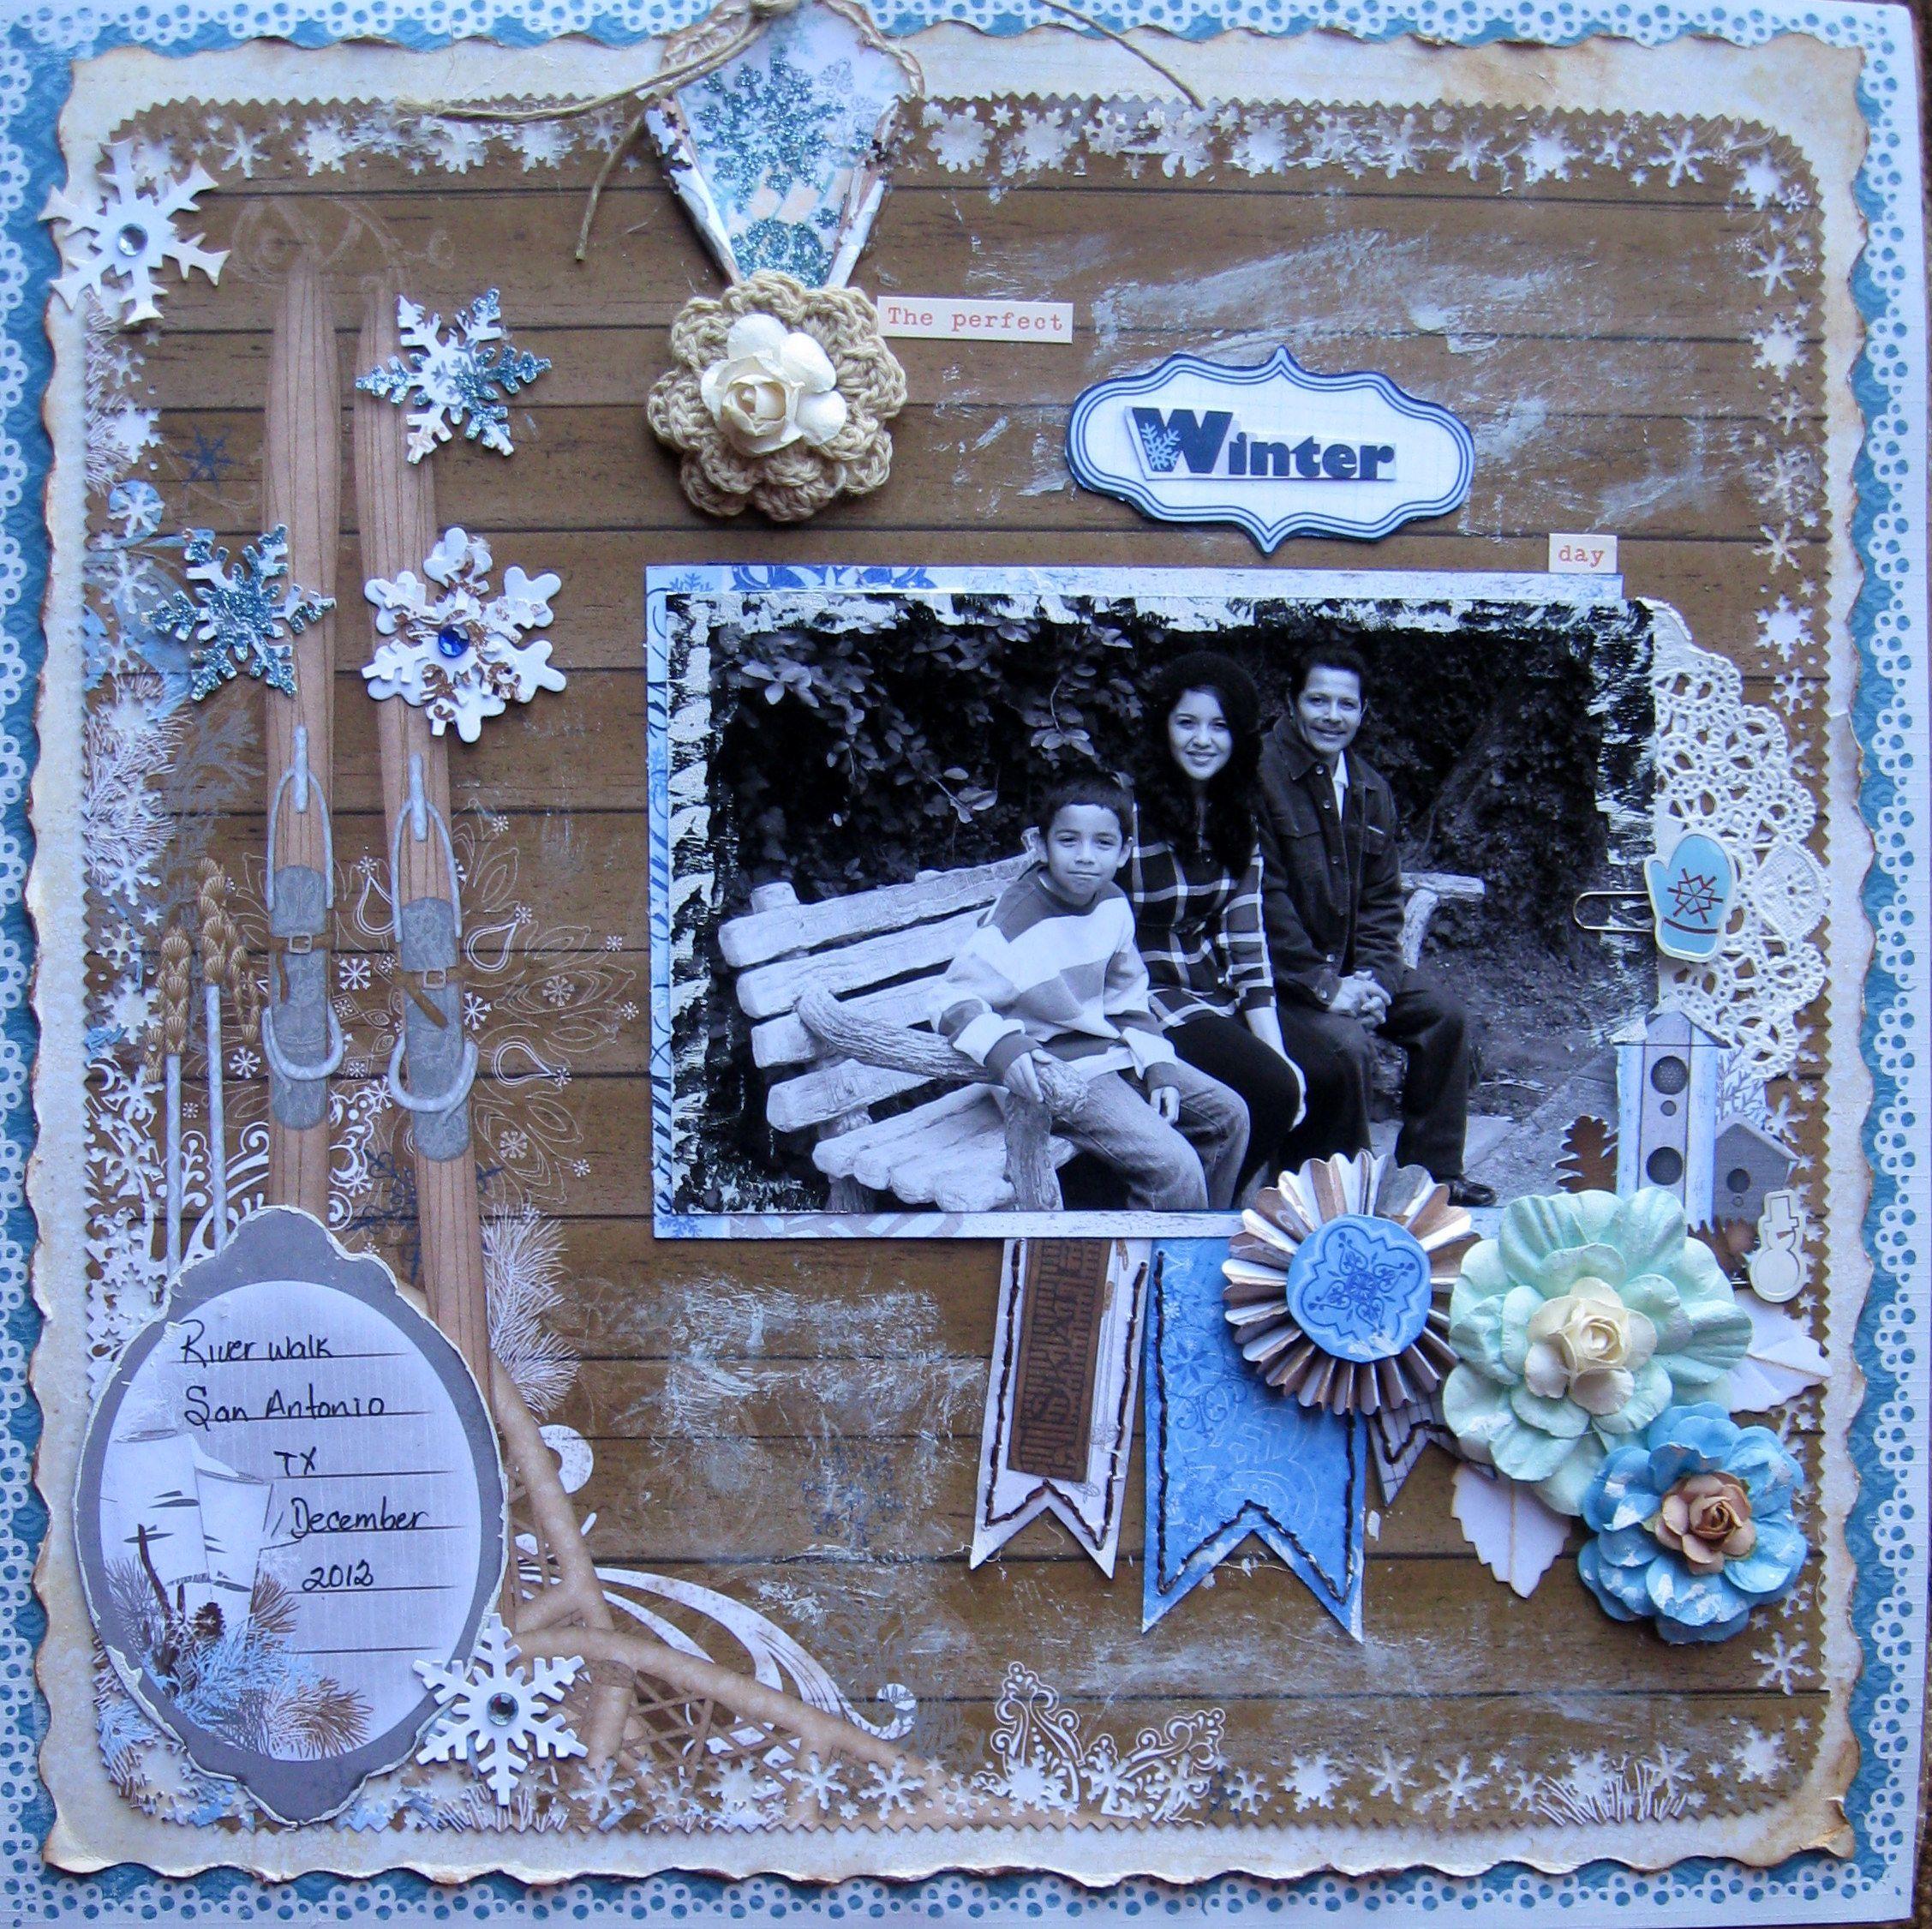 Bo Bunny - Powder Mountain - Rice8994: The perfect WINTER day..